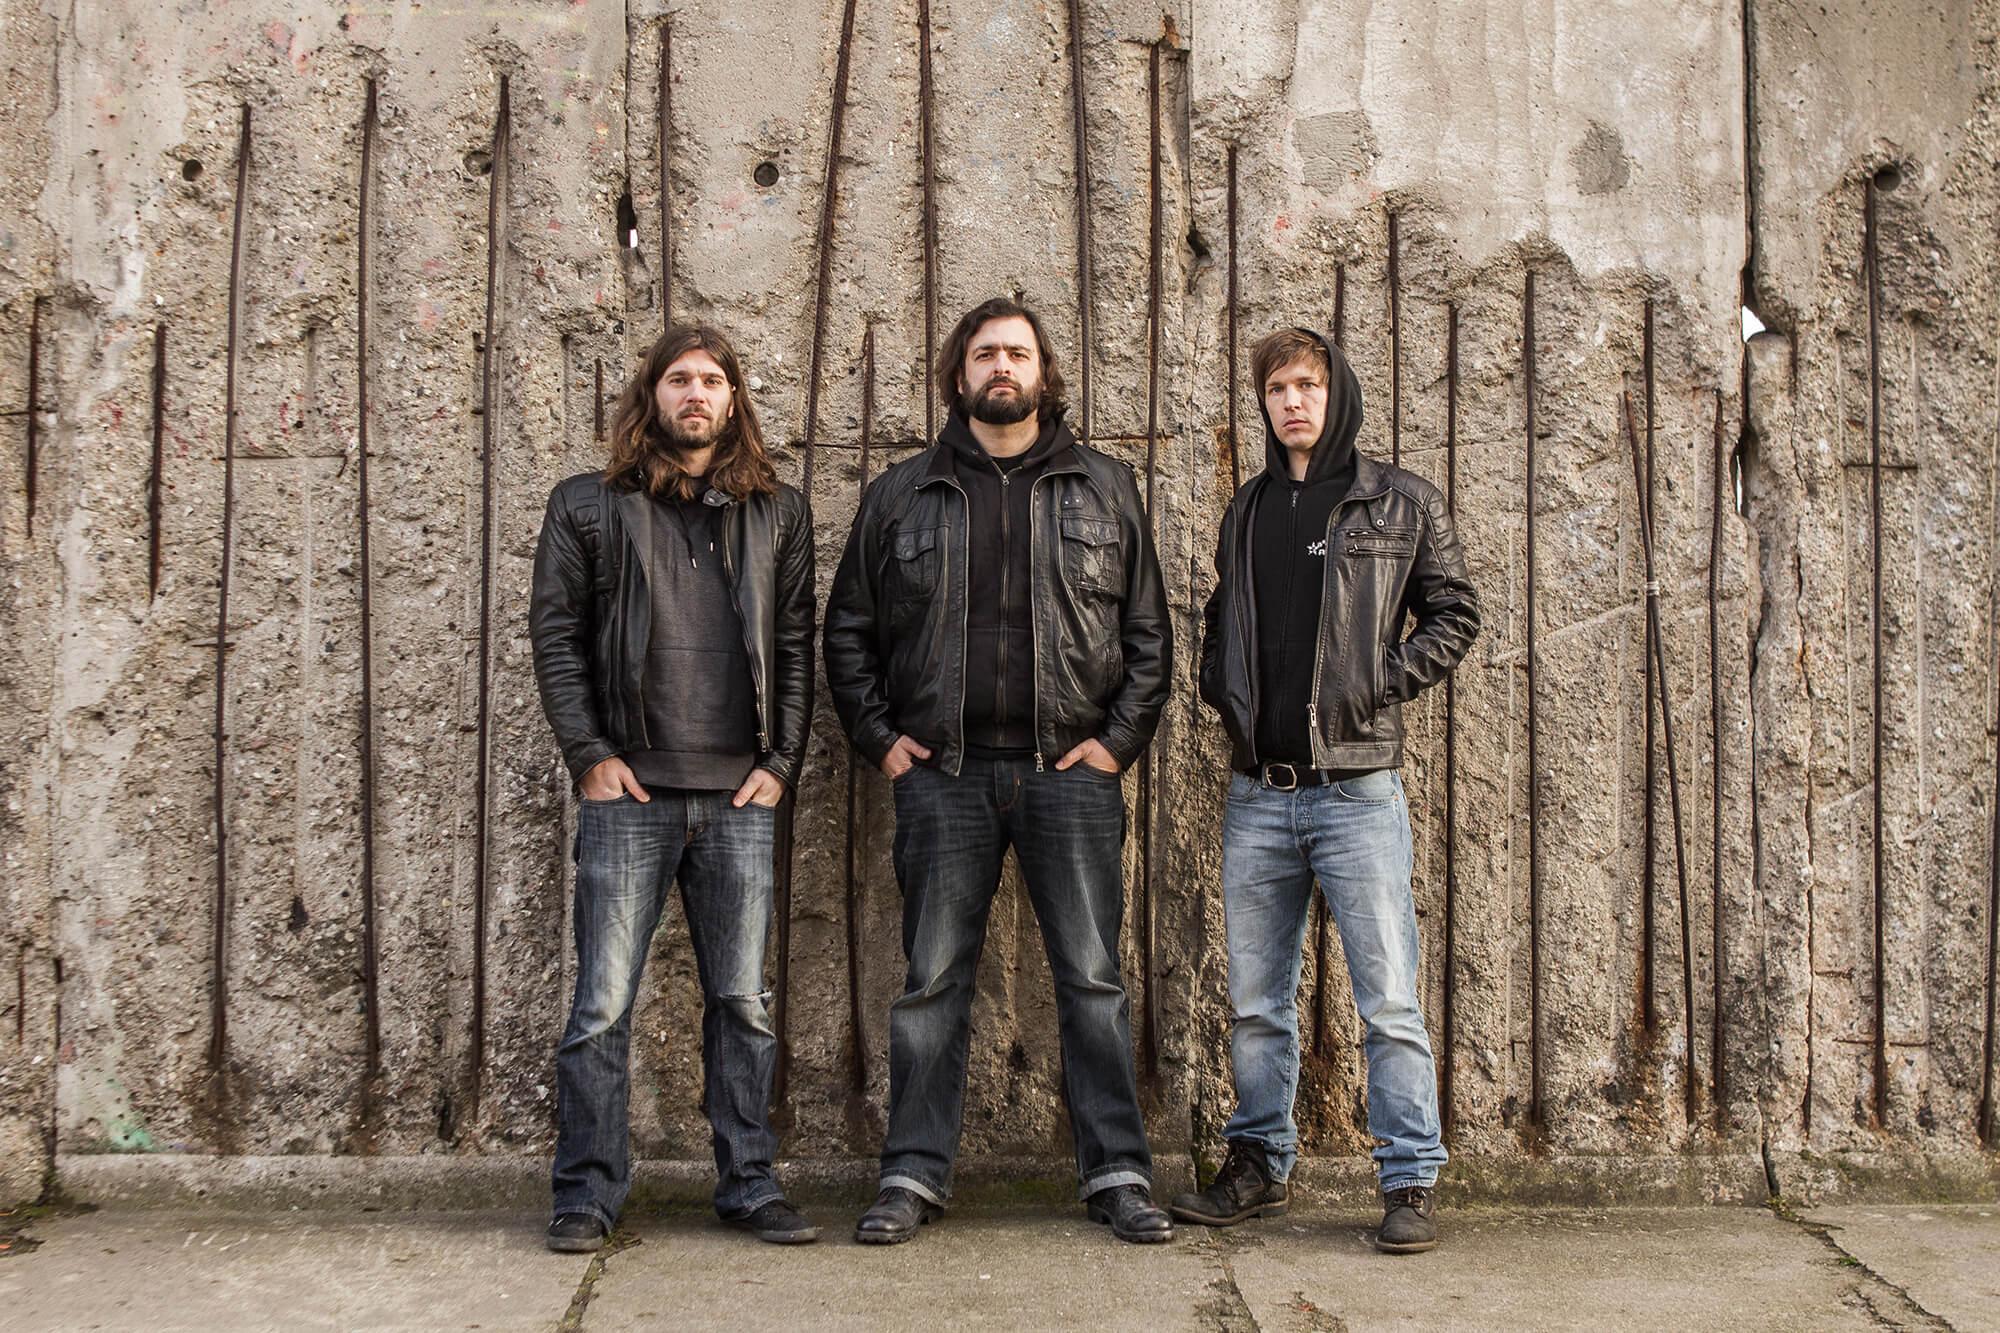 Samavayo trio bandpicture 2016